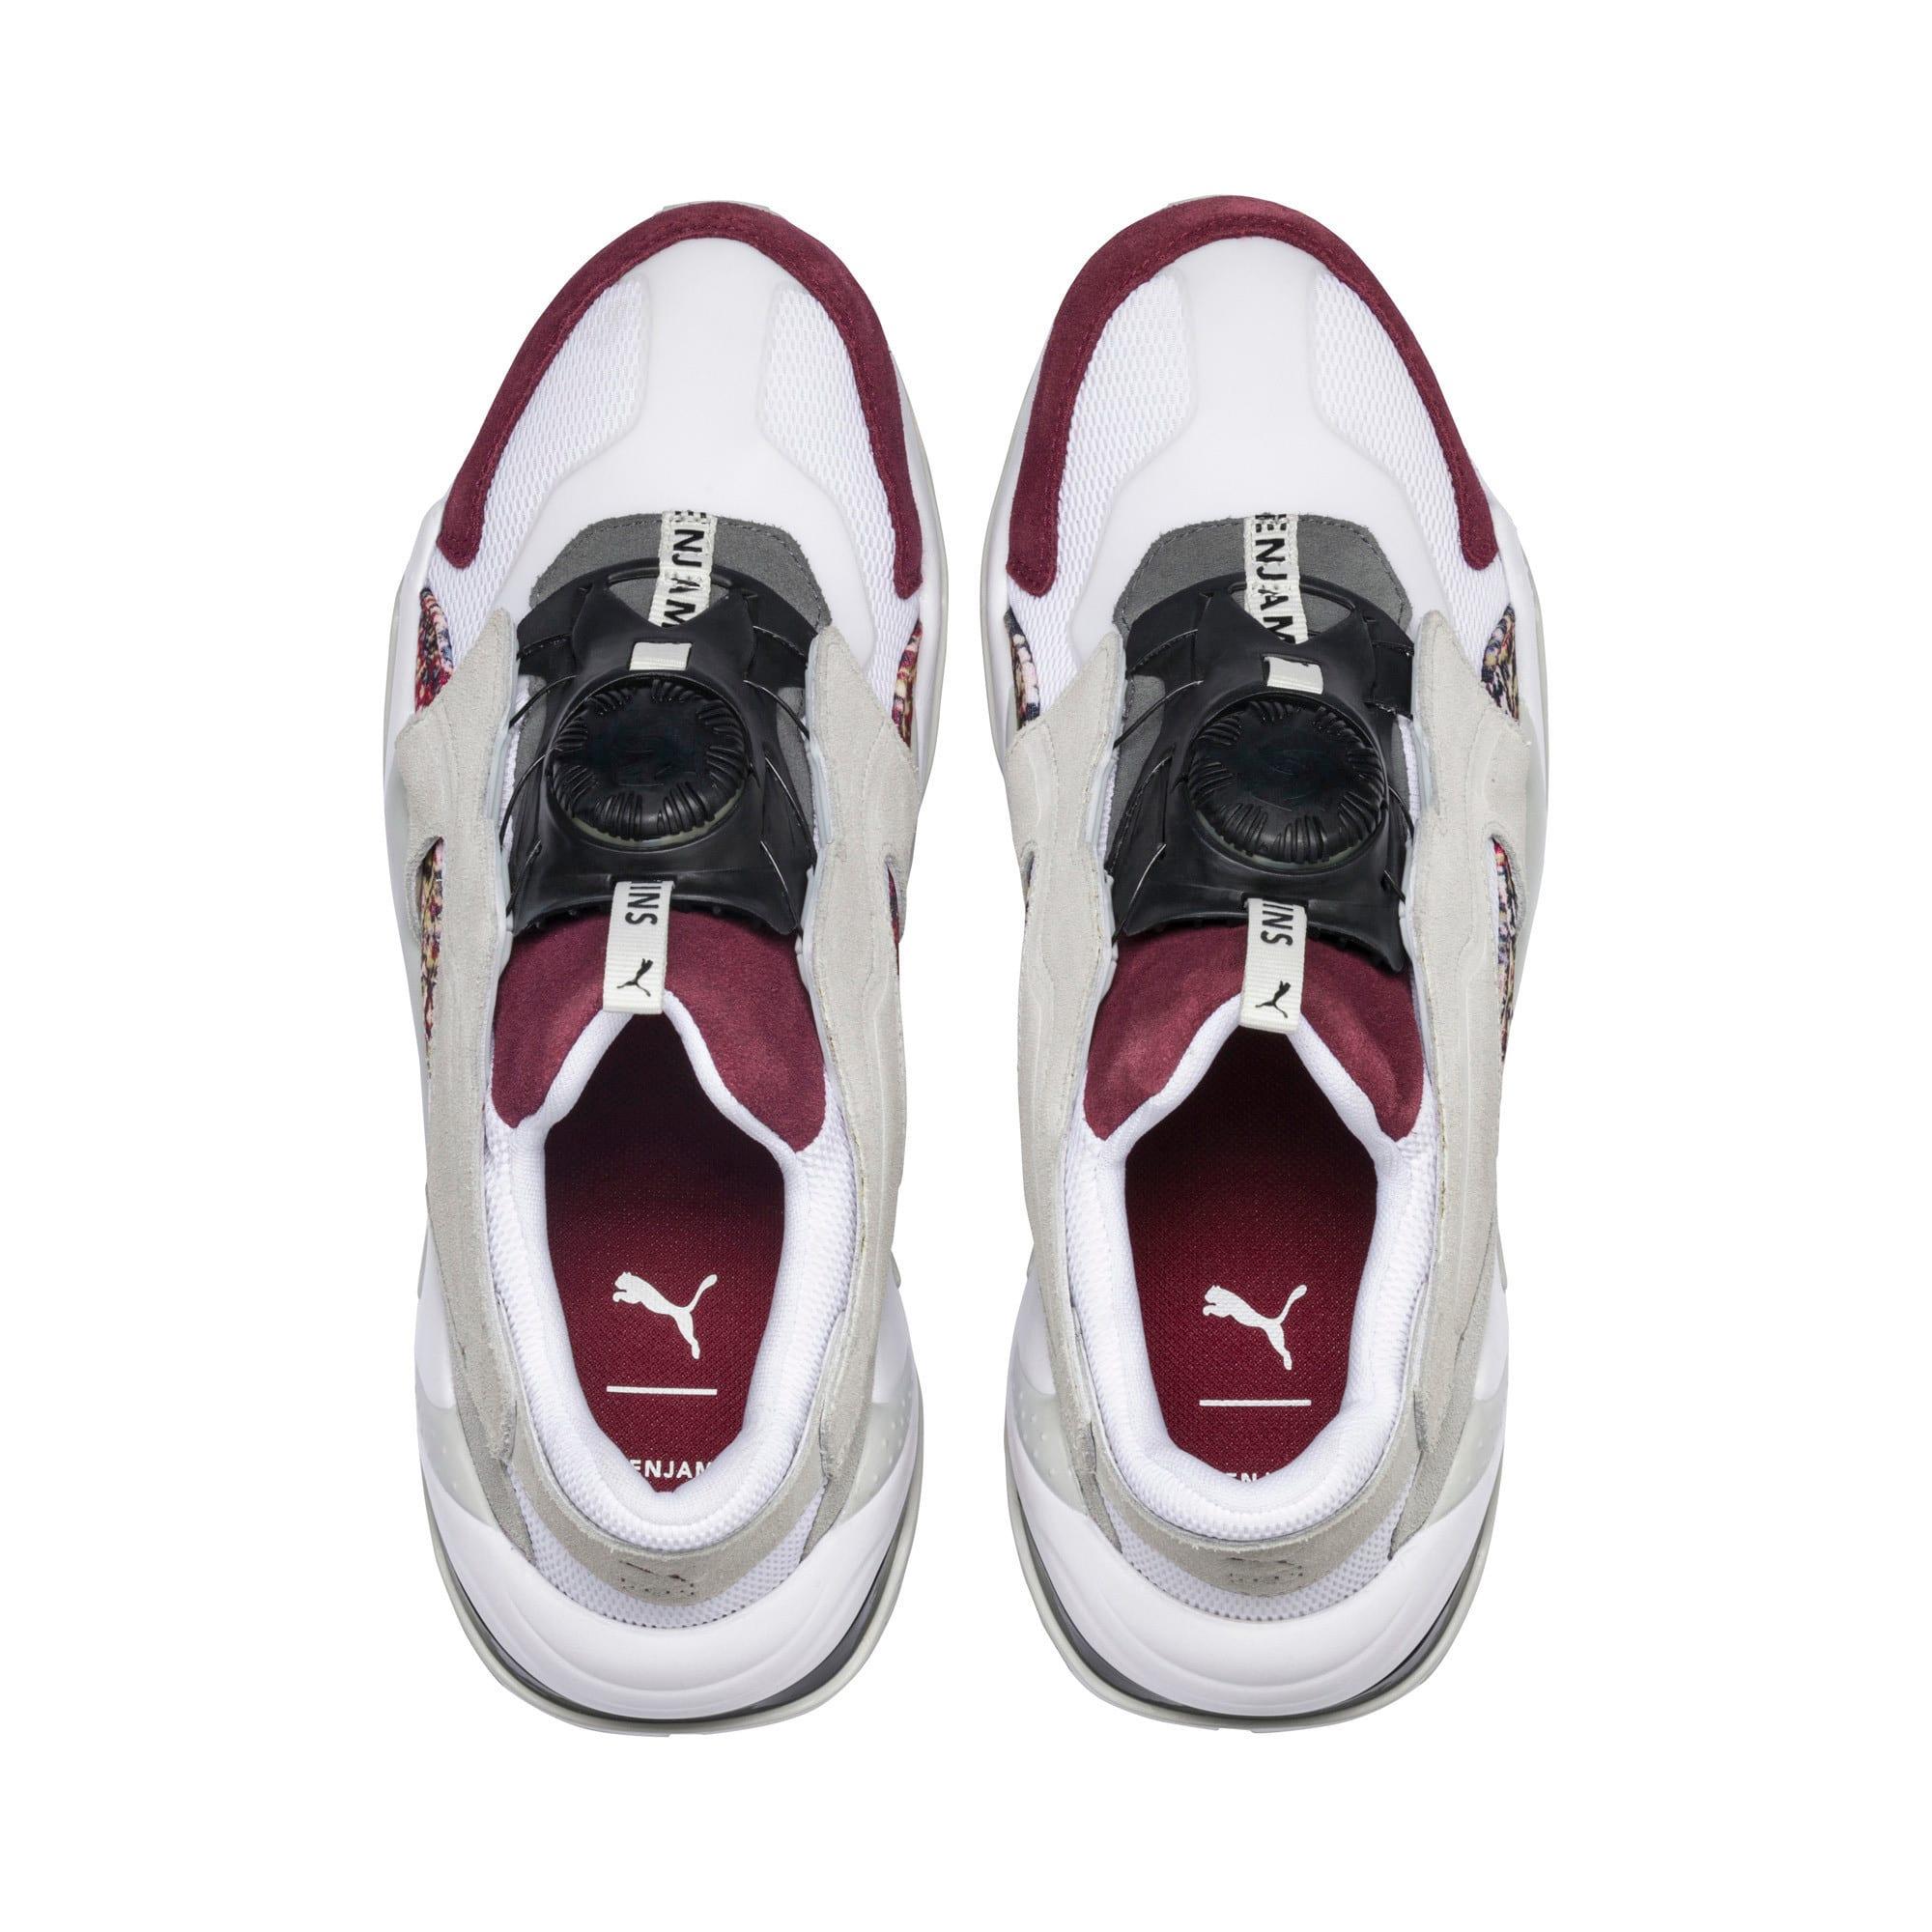 Thumbnail 7 of PUMA x LES BENJAMINS Thunder DISC Men's Sneakers, Puma White-Glacier Gray, medium